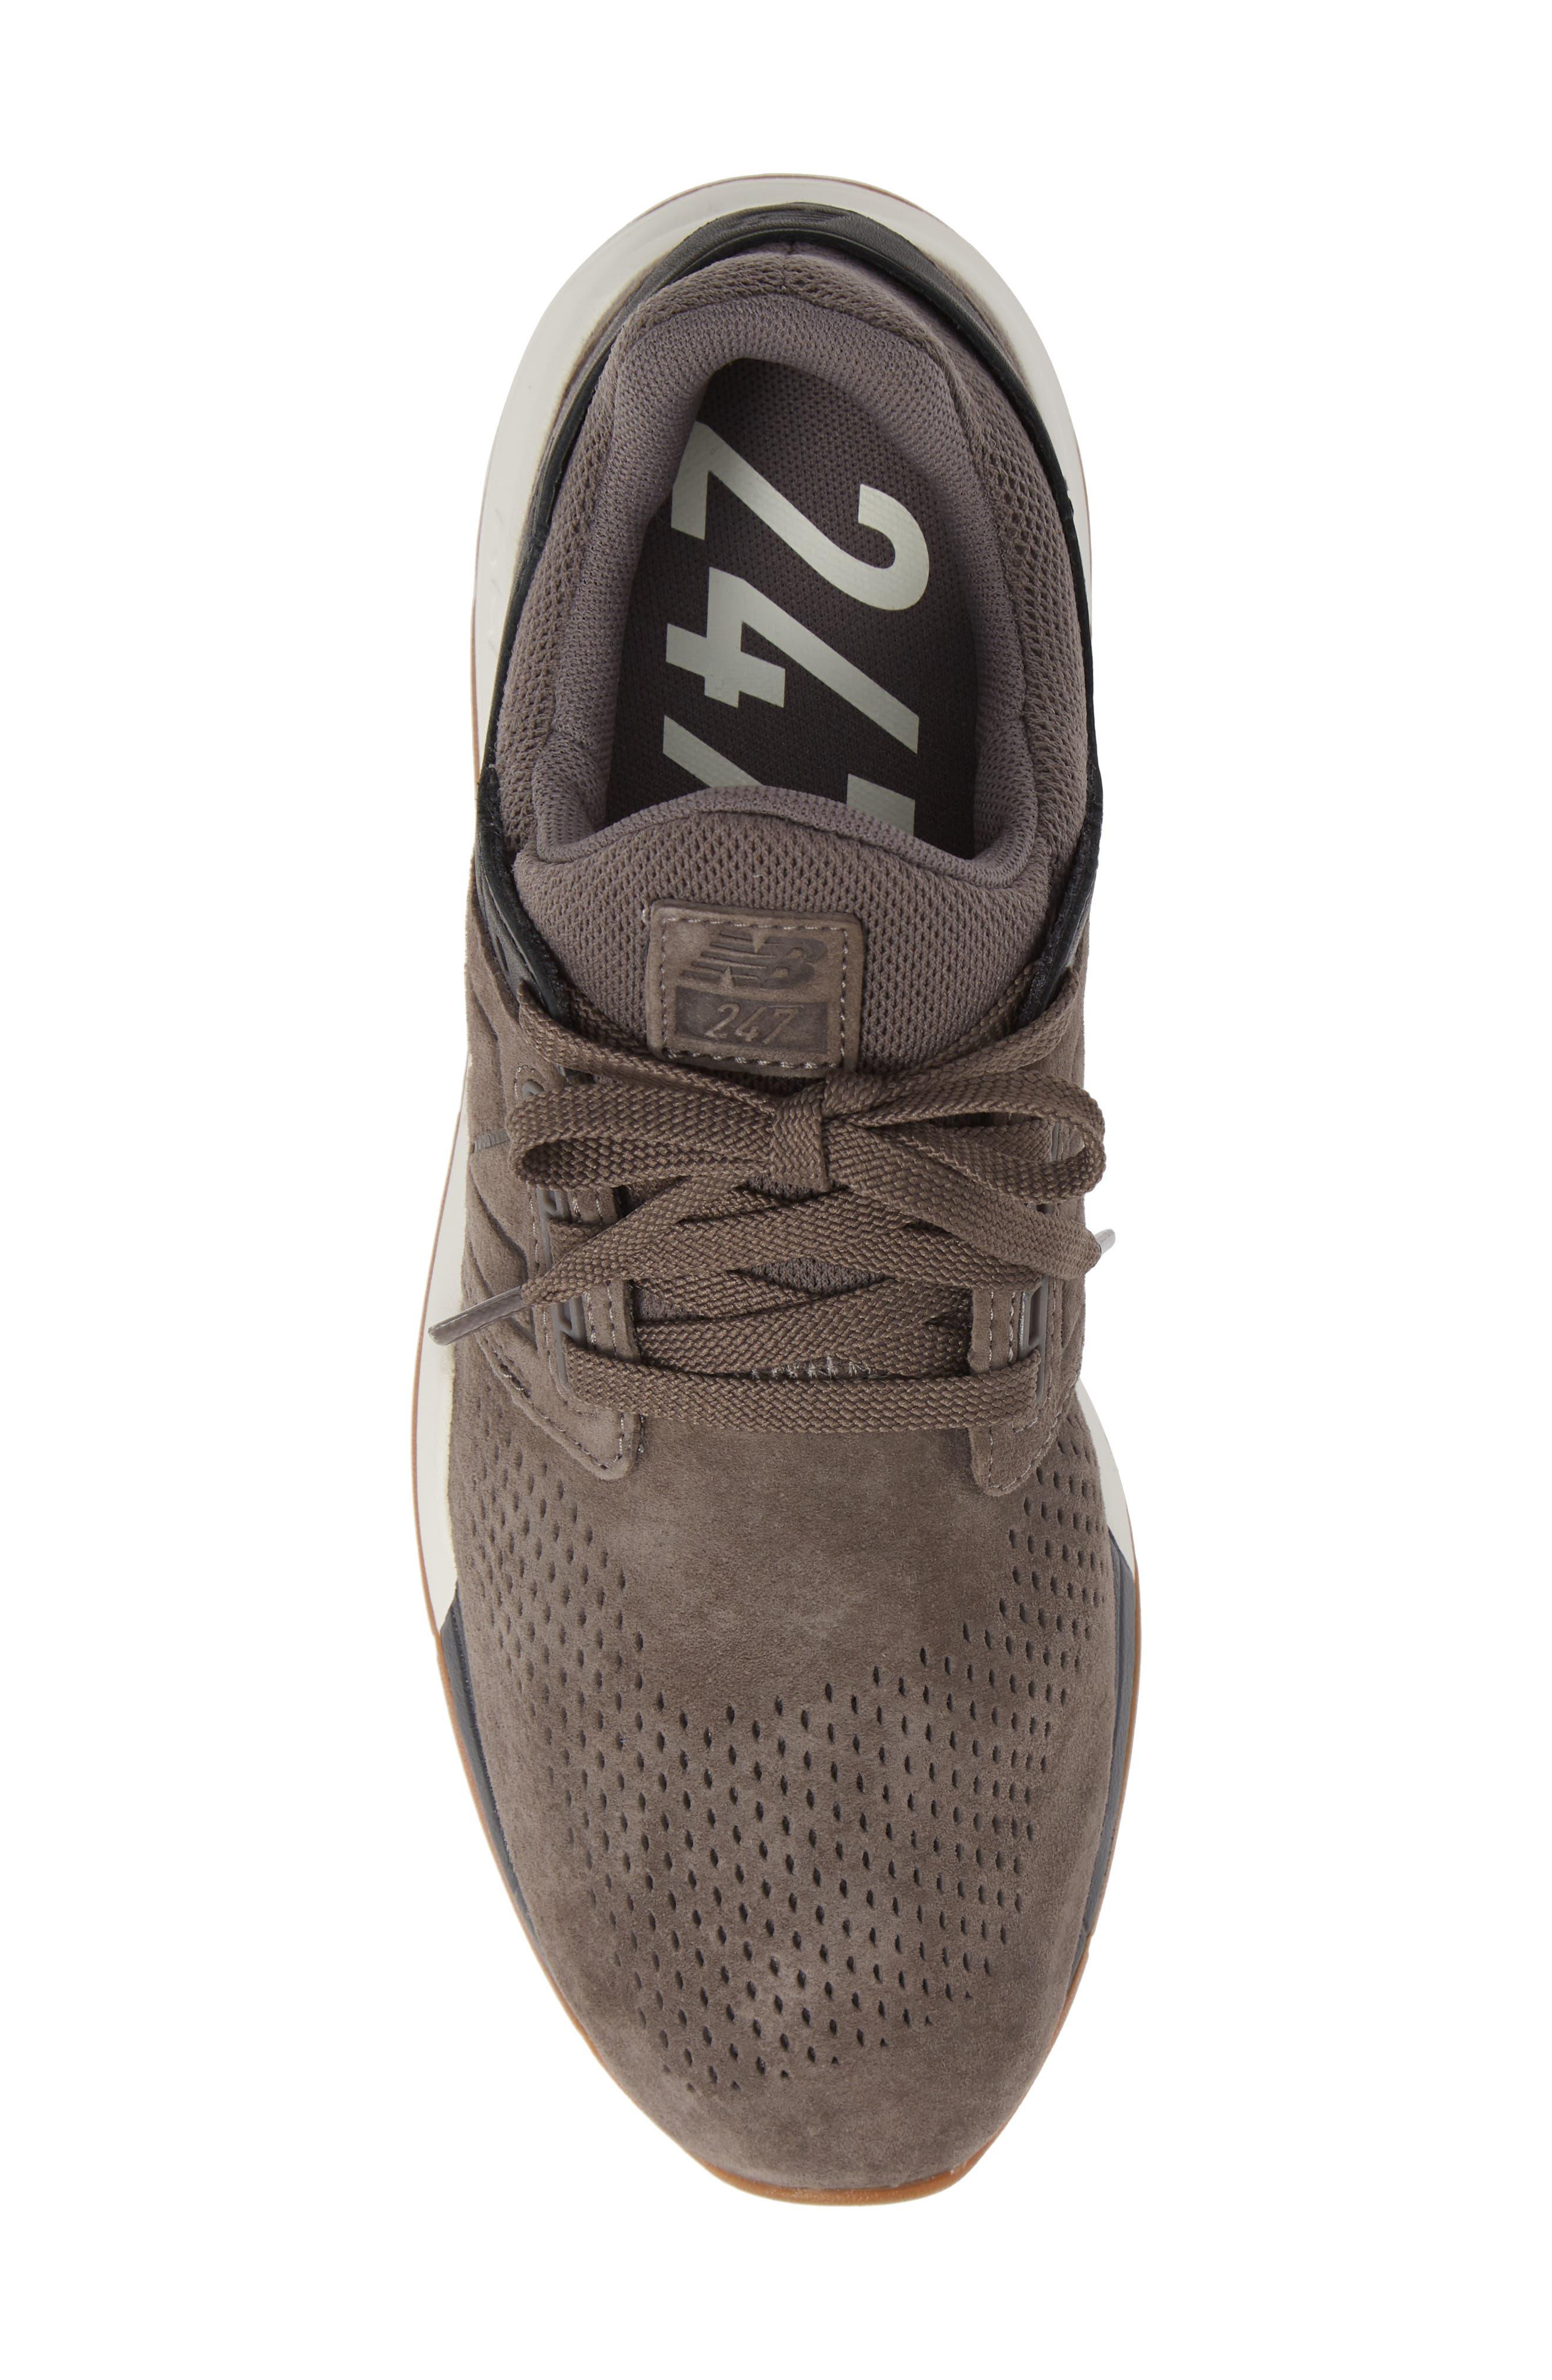 247v2 Sneaker,                             Alternate thumbnail 5, color,                             DARK GREY NUBUCK LEATHER